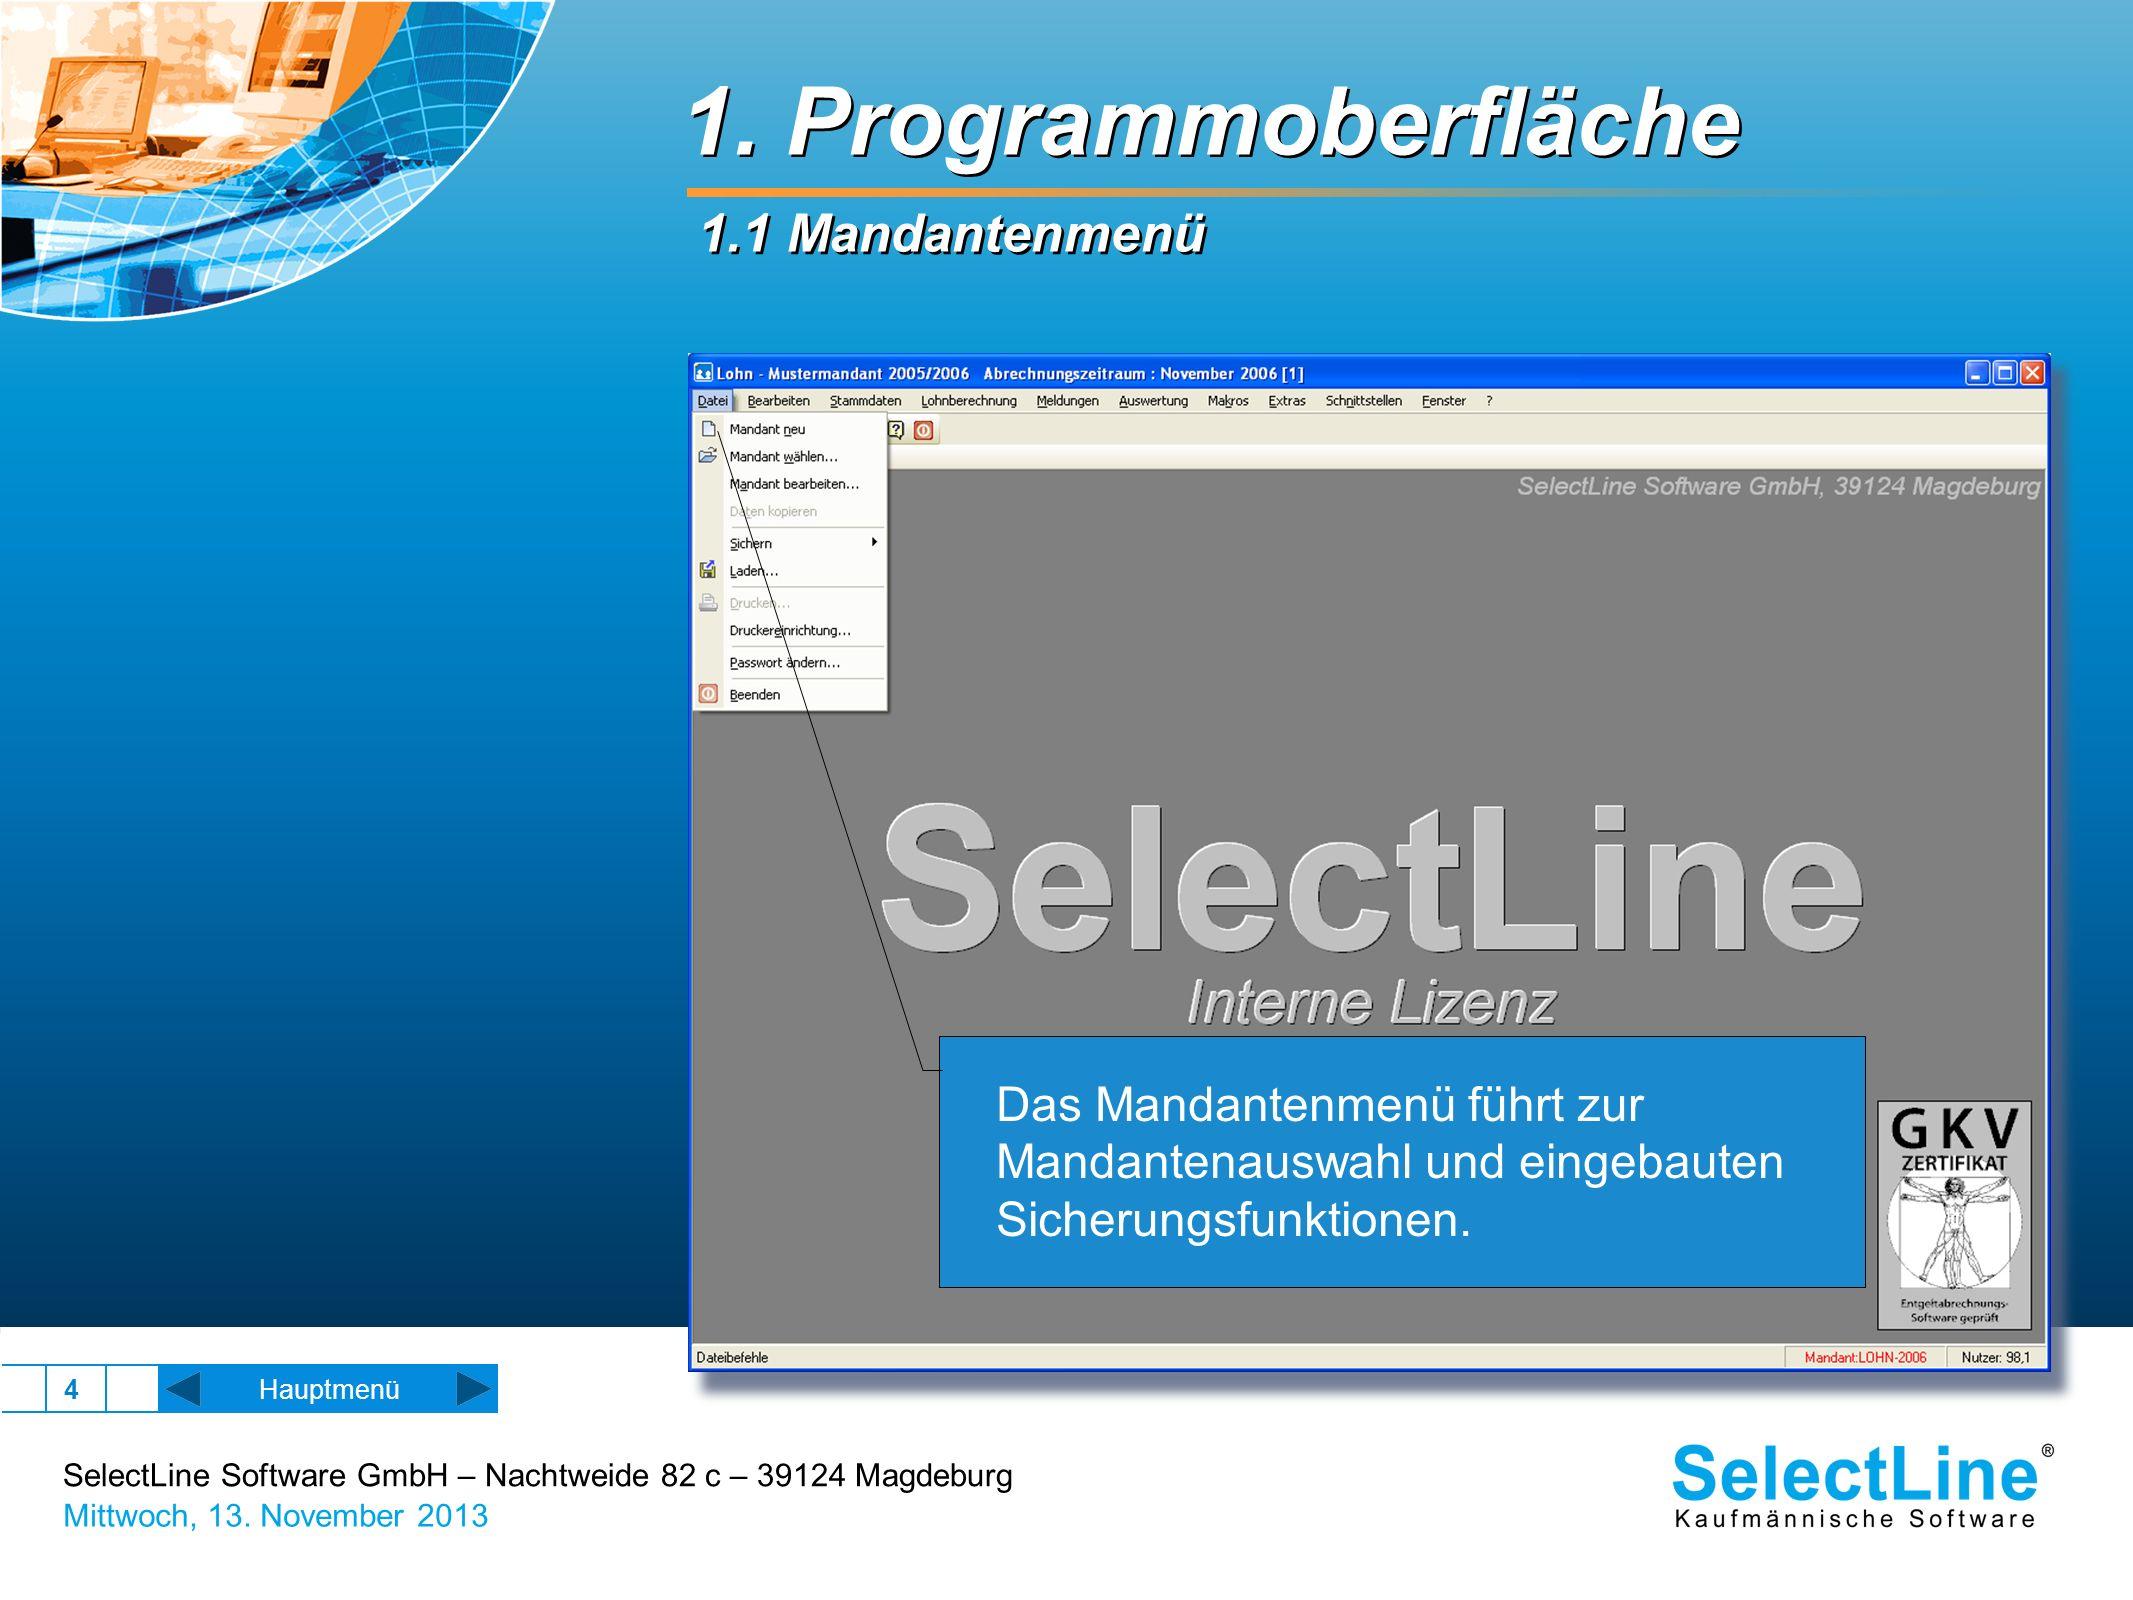 SelectLine Software GmbH – Nachtweide 82 c – 39124 Magdeburg Mittwoch, 13. November 2013 4 1. Programmoberfläche 1.1 Mandantenmenü Hauptmenü Das Manda